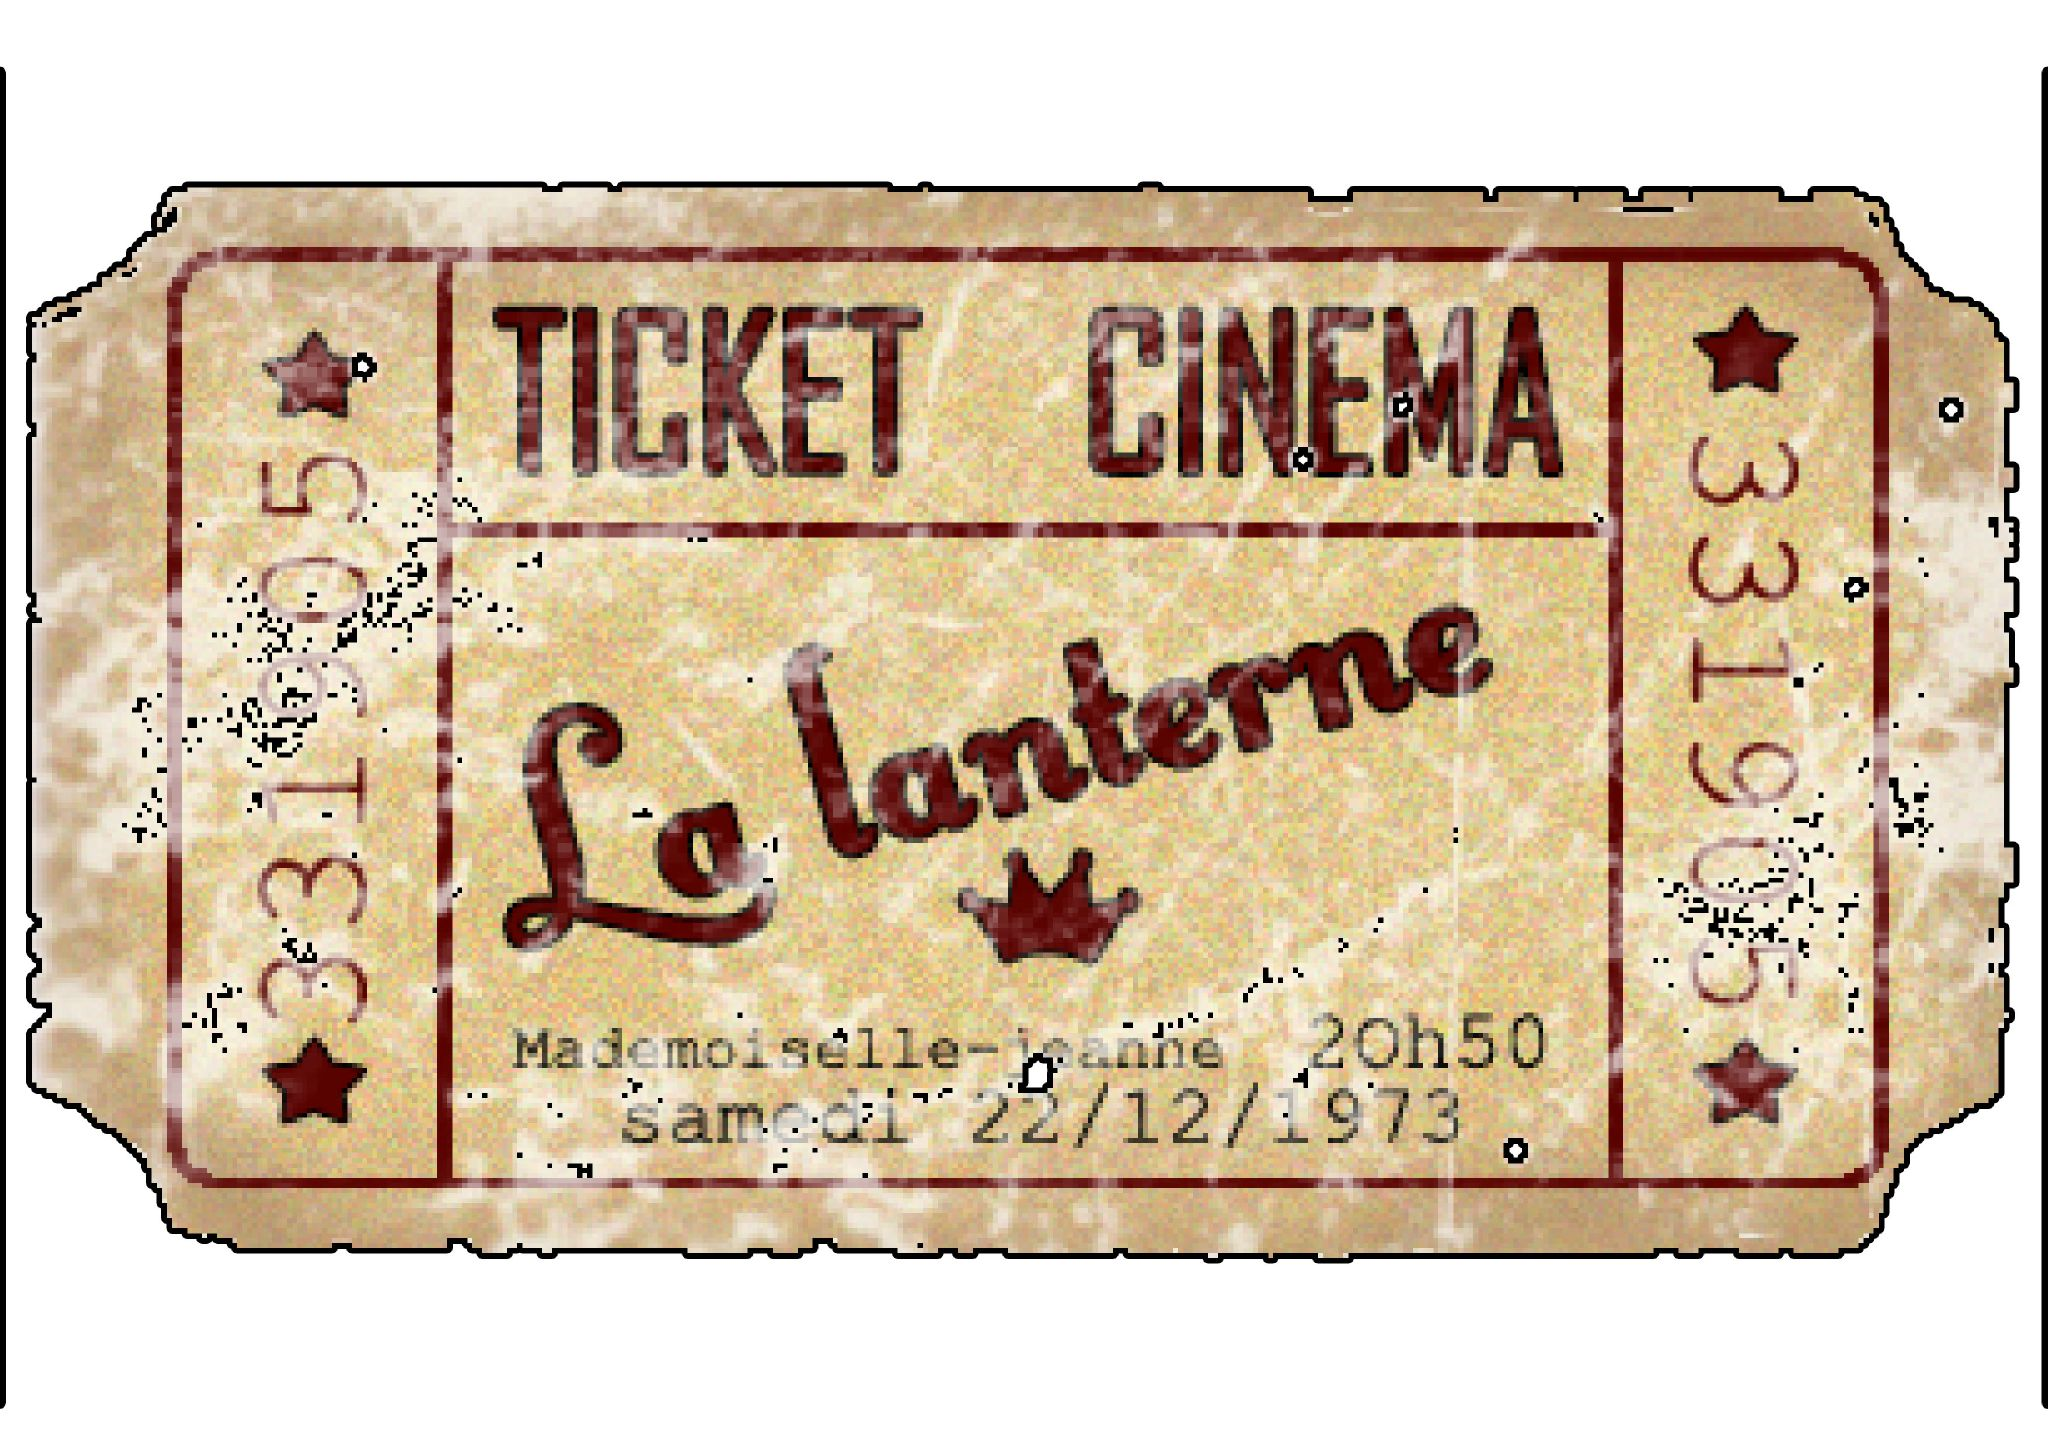 ticket de cinema